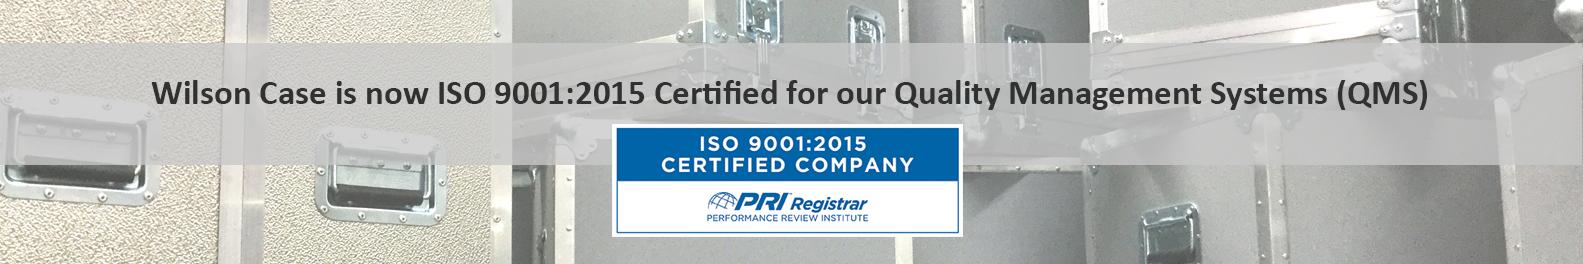 Wilson Case ISO 9001:2015 Certified